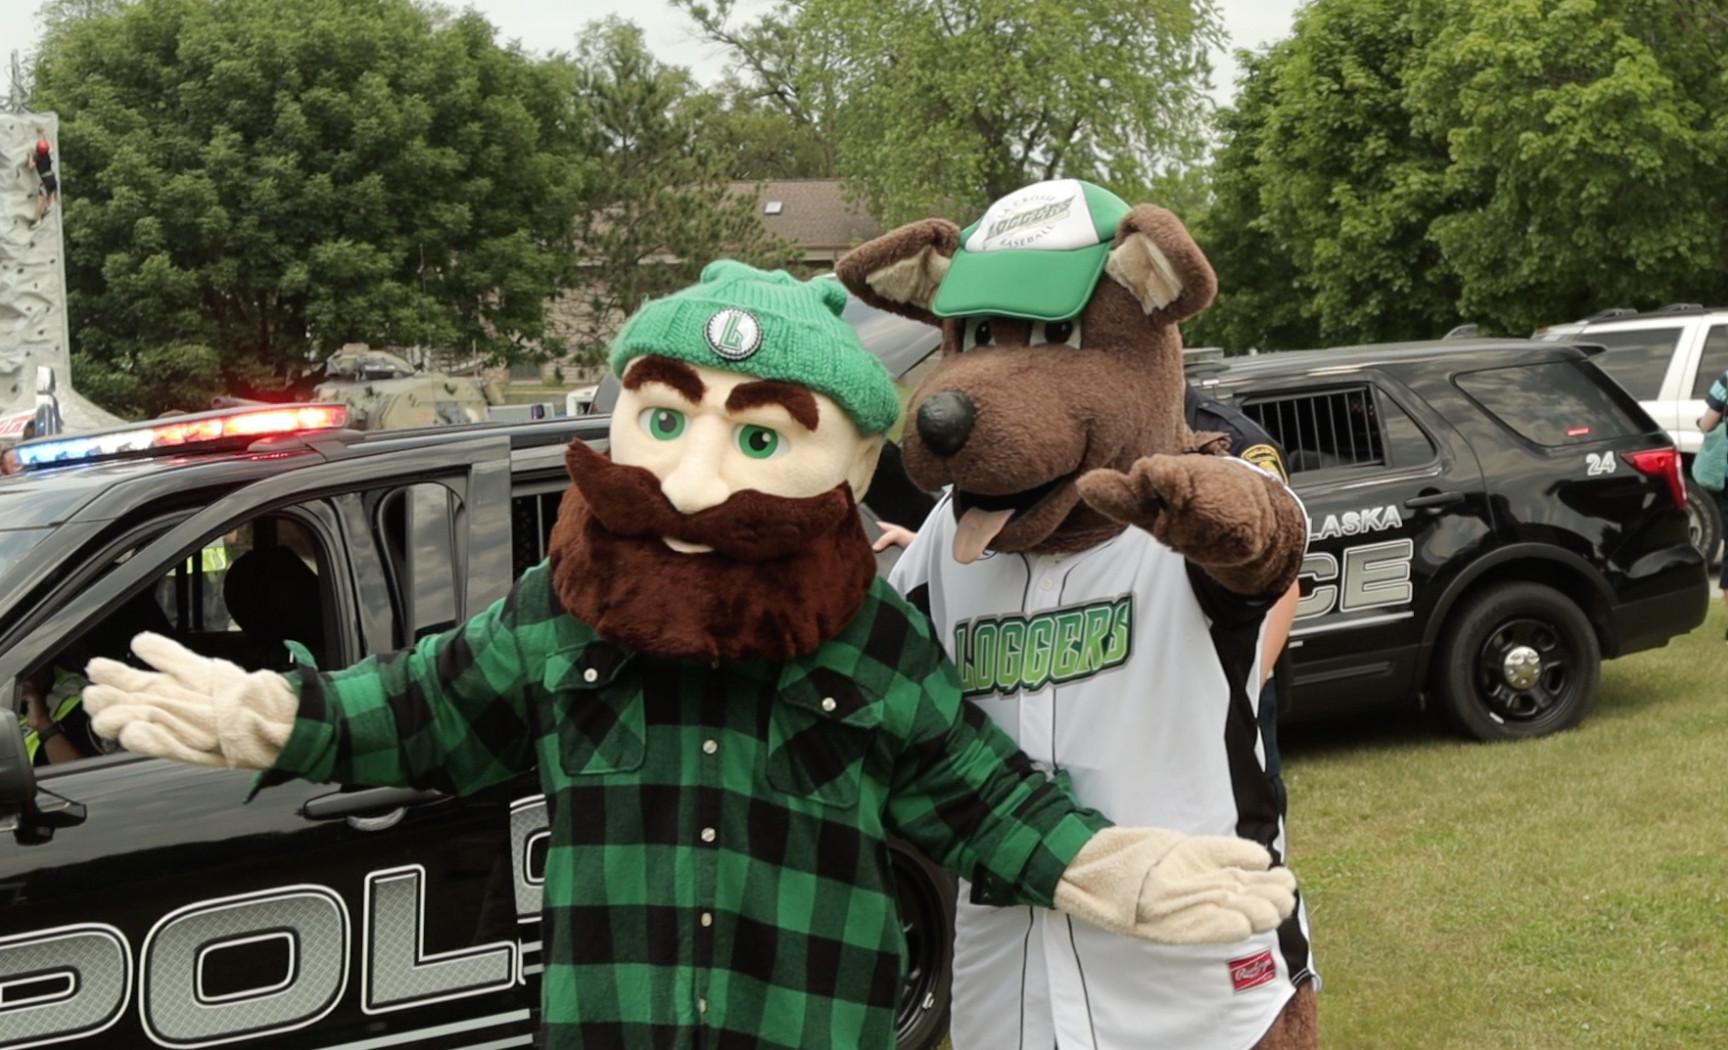 Mascots at Community Days